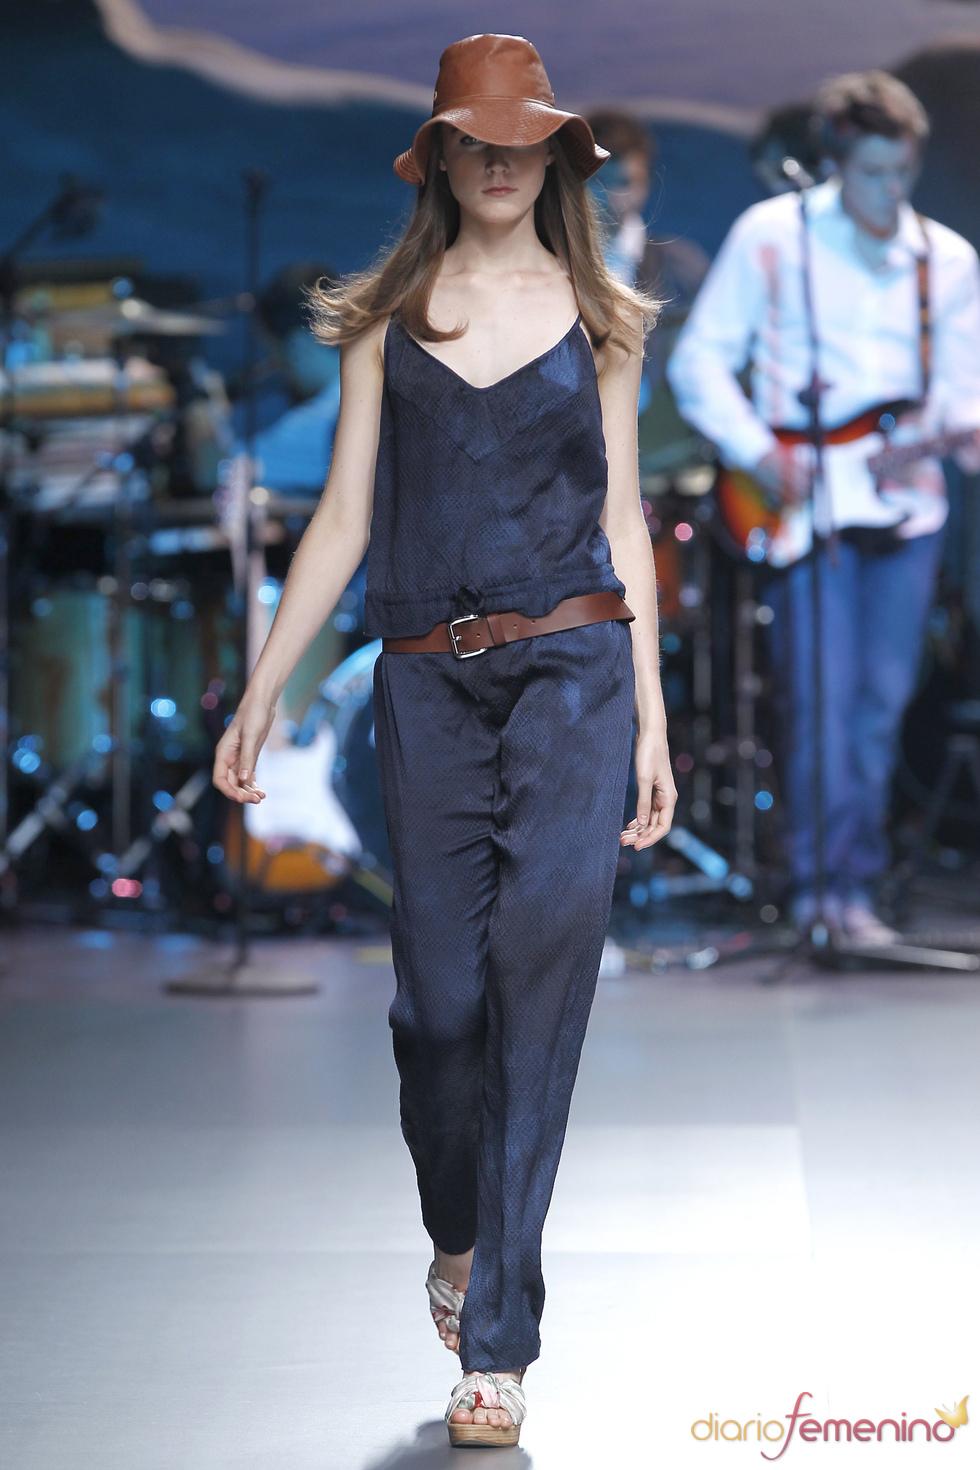 Sutil degradado de TCN para la Madrid Fashion Week